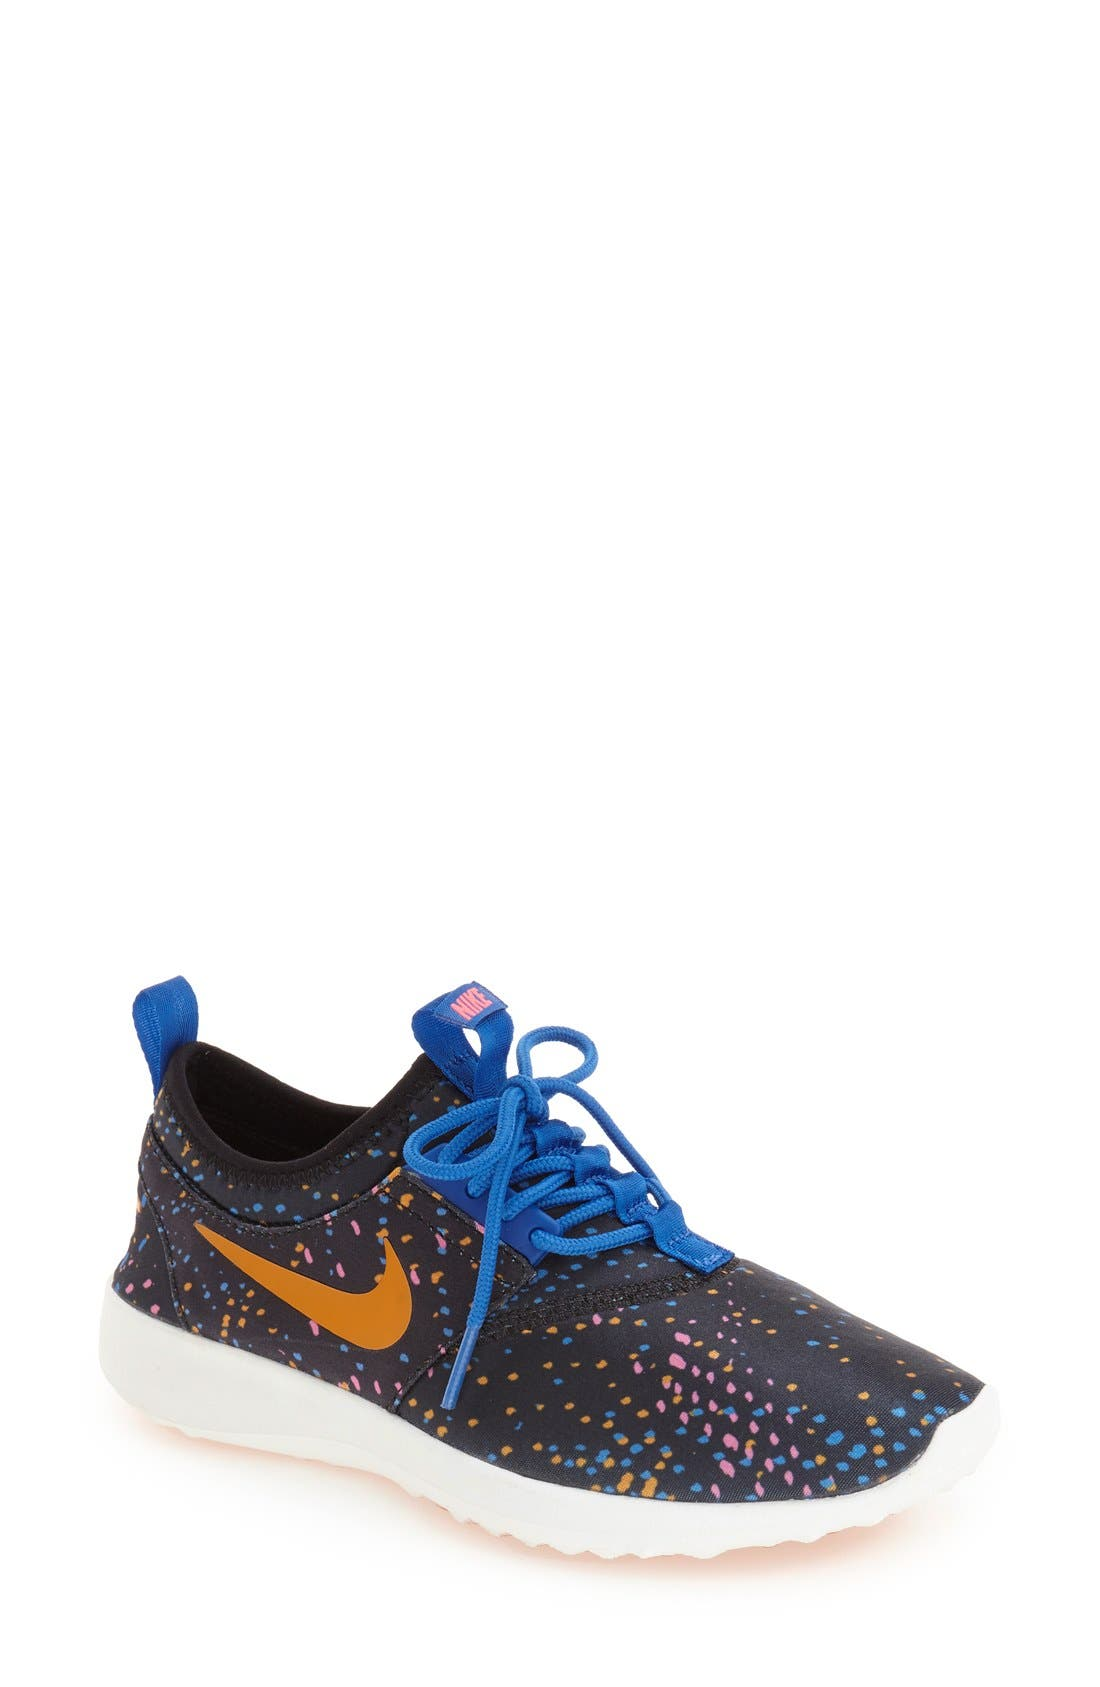 Alternate Image 1 Selected - Nike 'Juvenate' Print Sneaker (Women)